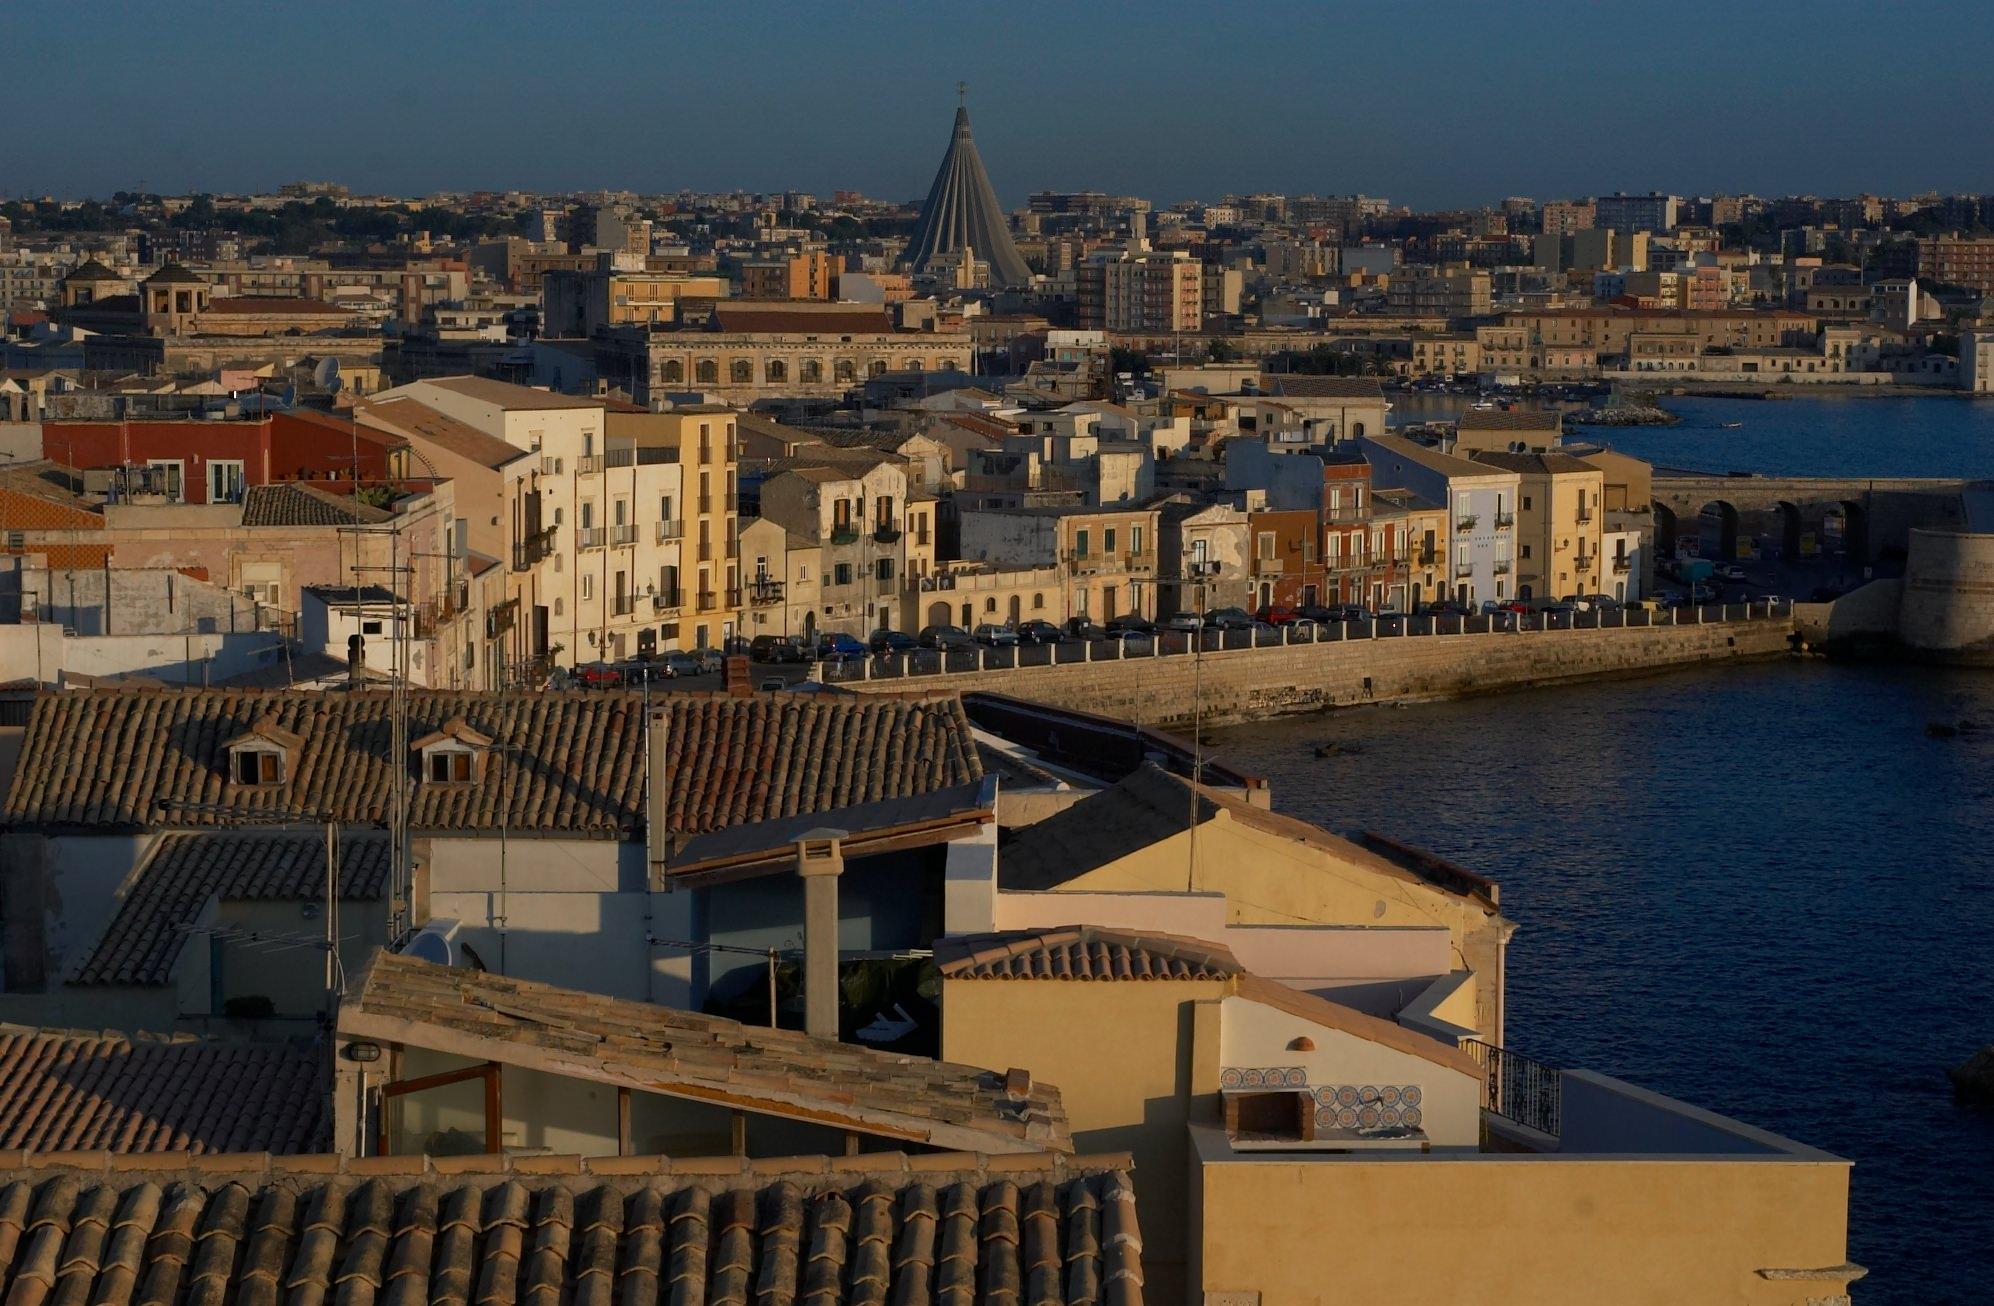 Compagnia spagnola gestirà servizio idrico a Siracusa